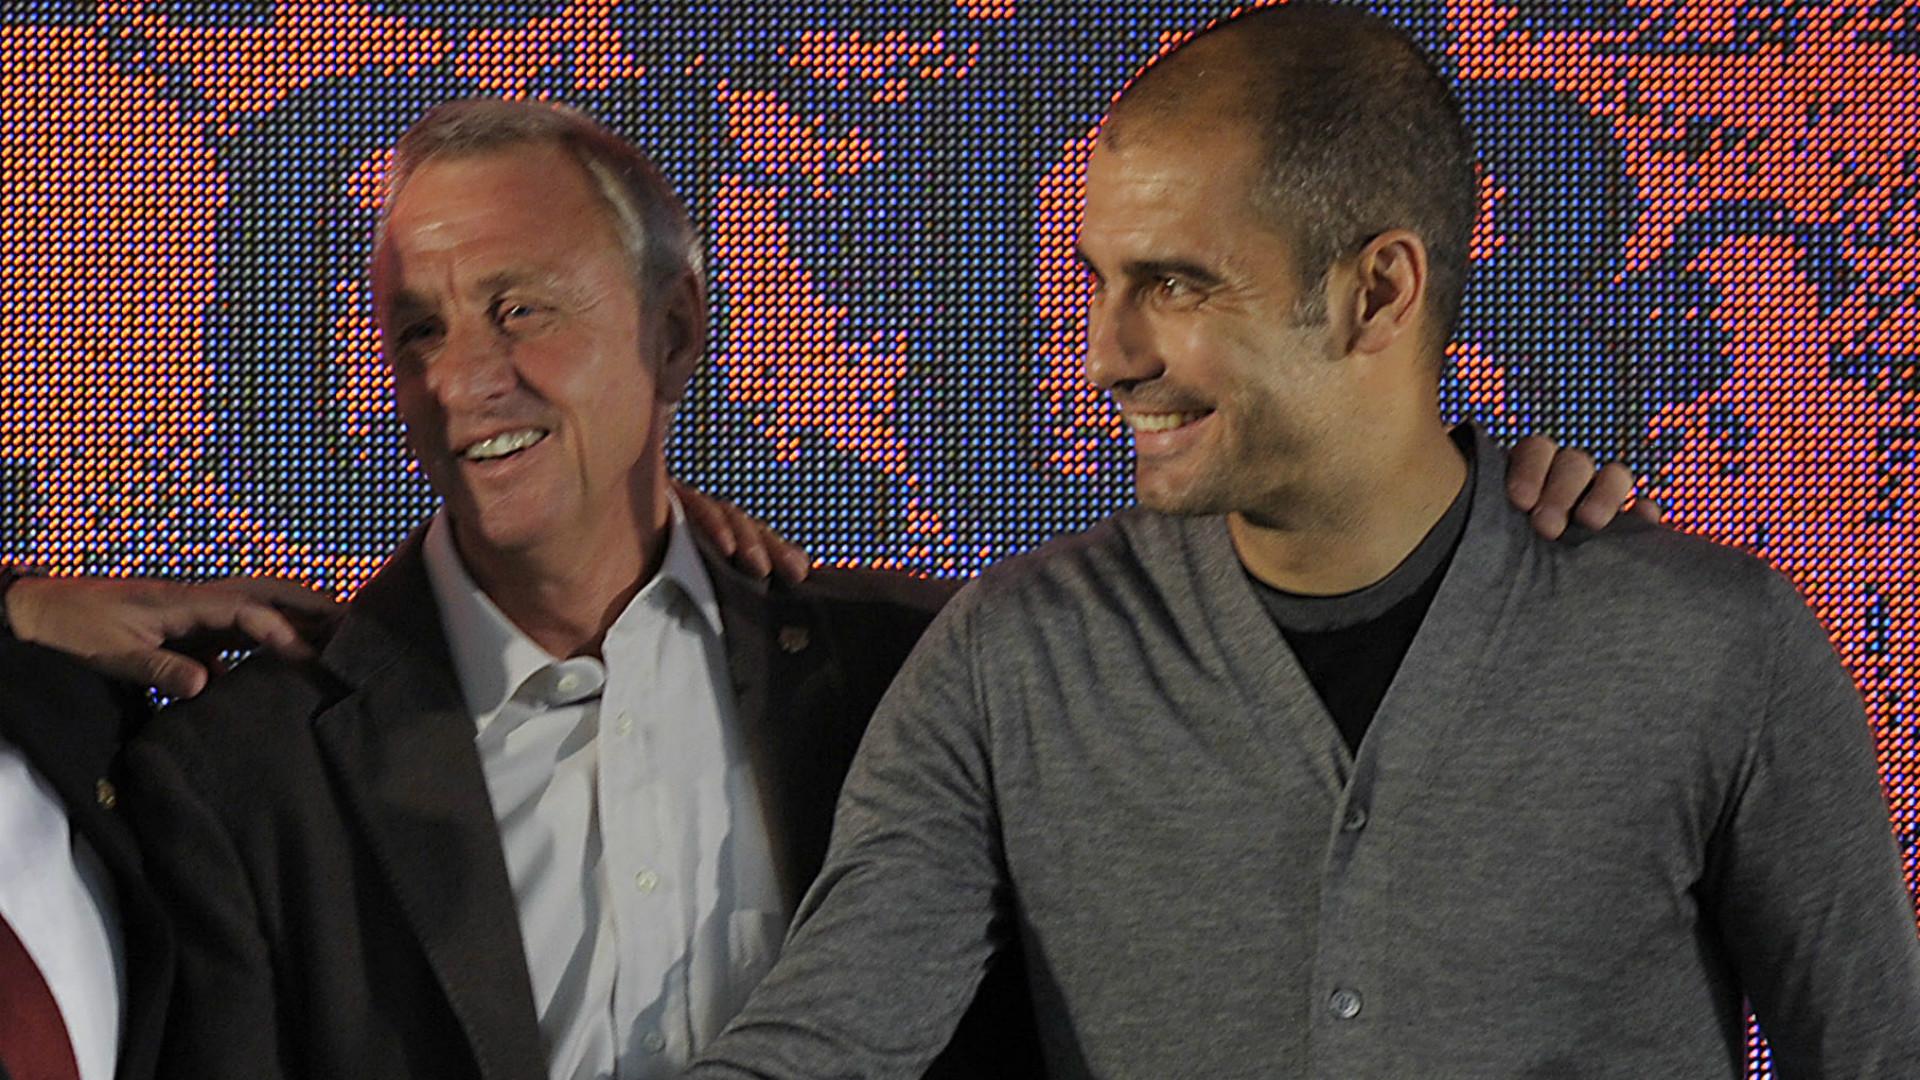 Johan Cruyff Pep Guardiola Barcelona